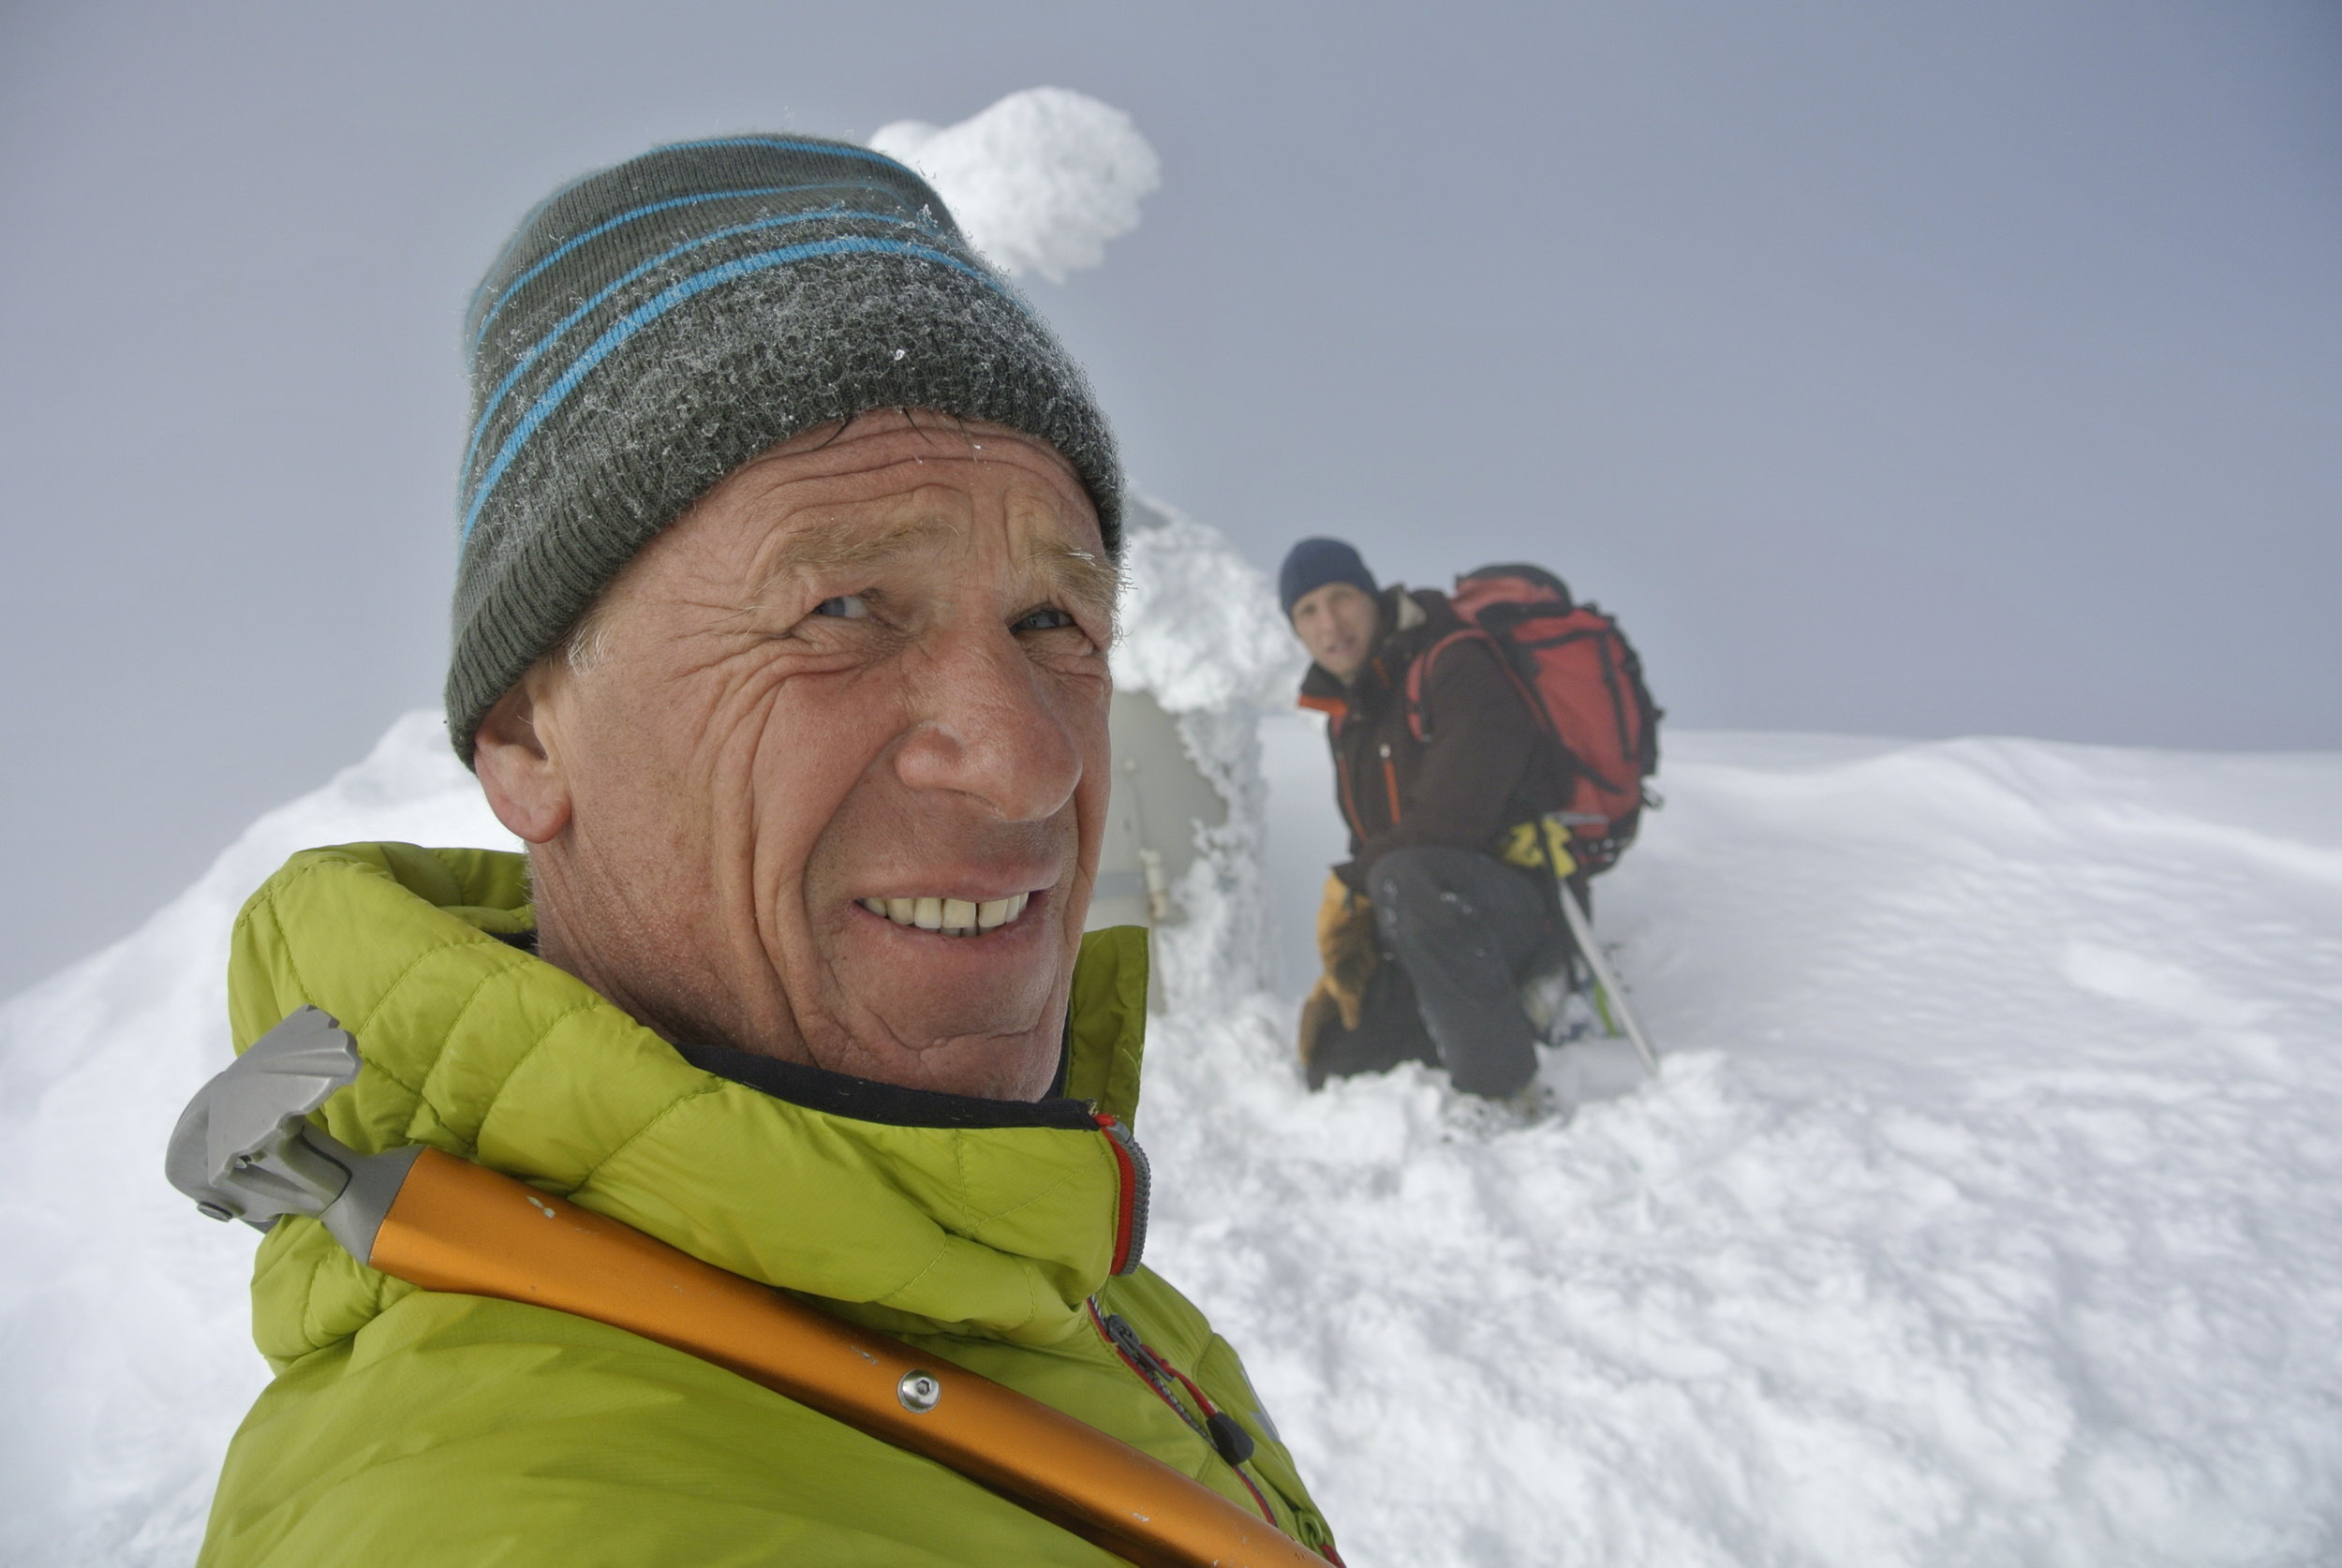 Mountain guide Franc Pepevnik Aco